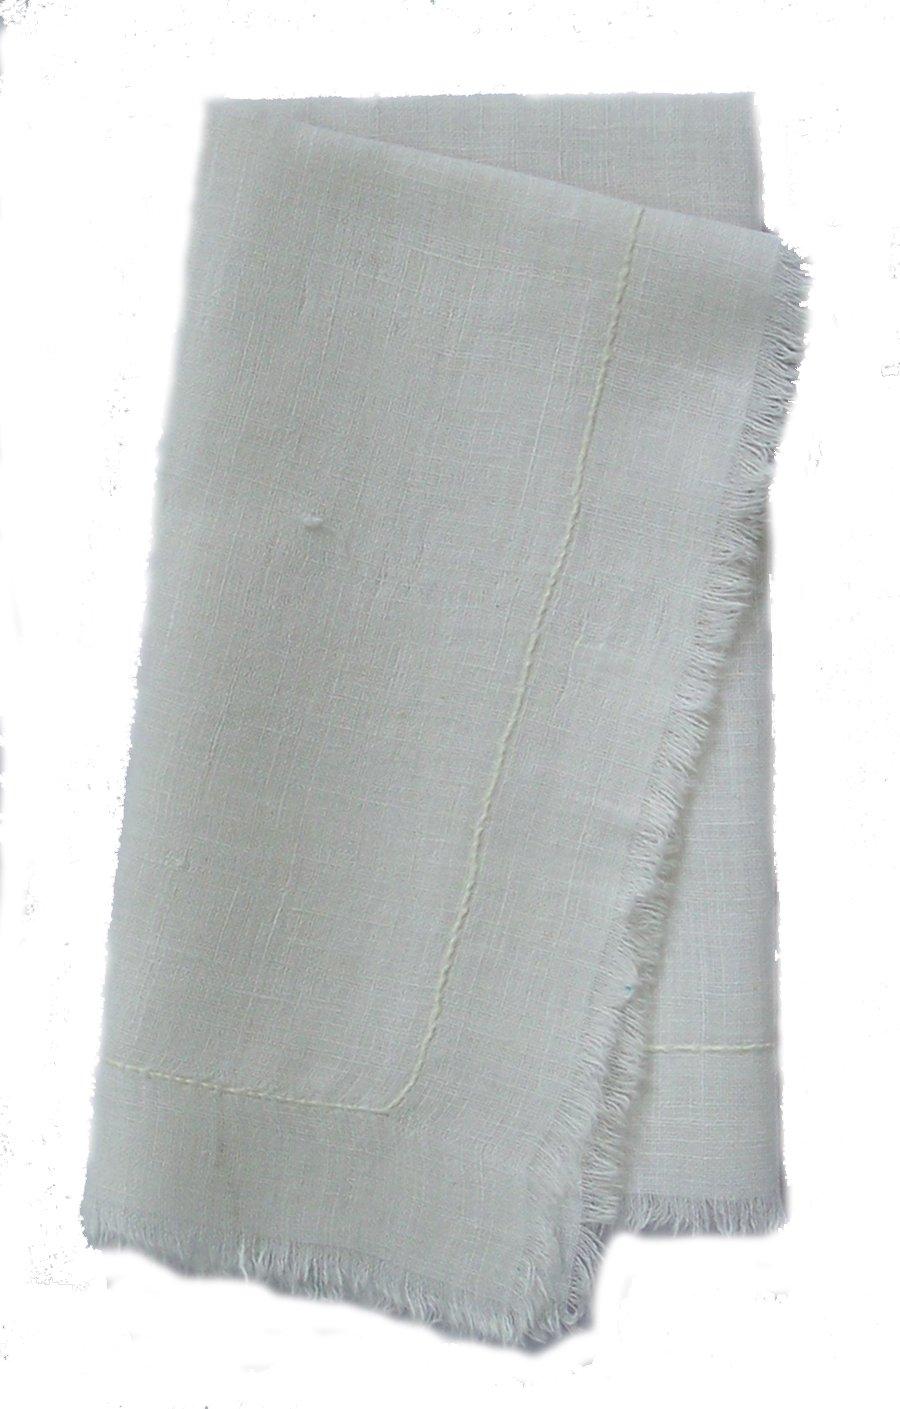 Gitika GoyalホームカーディChikanworkナプキンラインデザイン(セットof 4 ) NAPLINWH  ホワイト B009DSPH6C